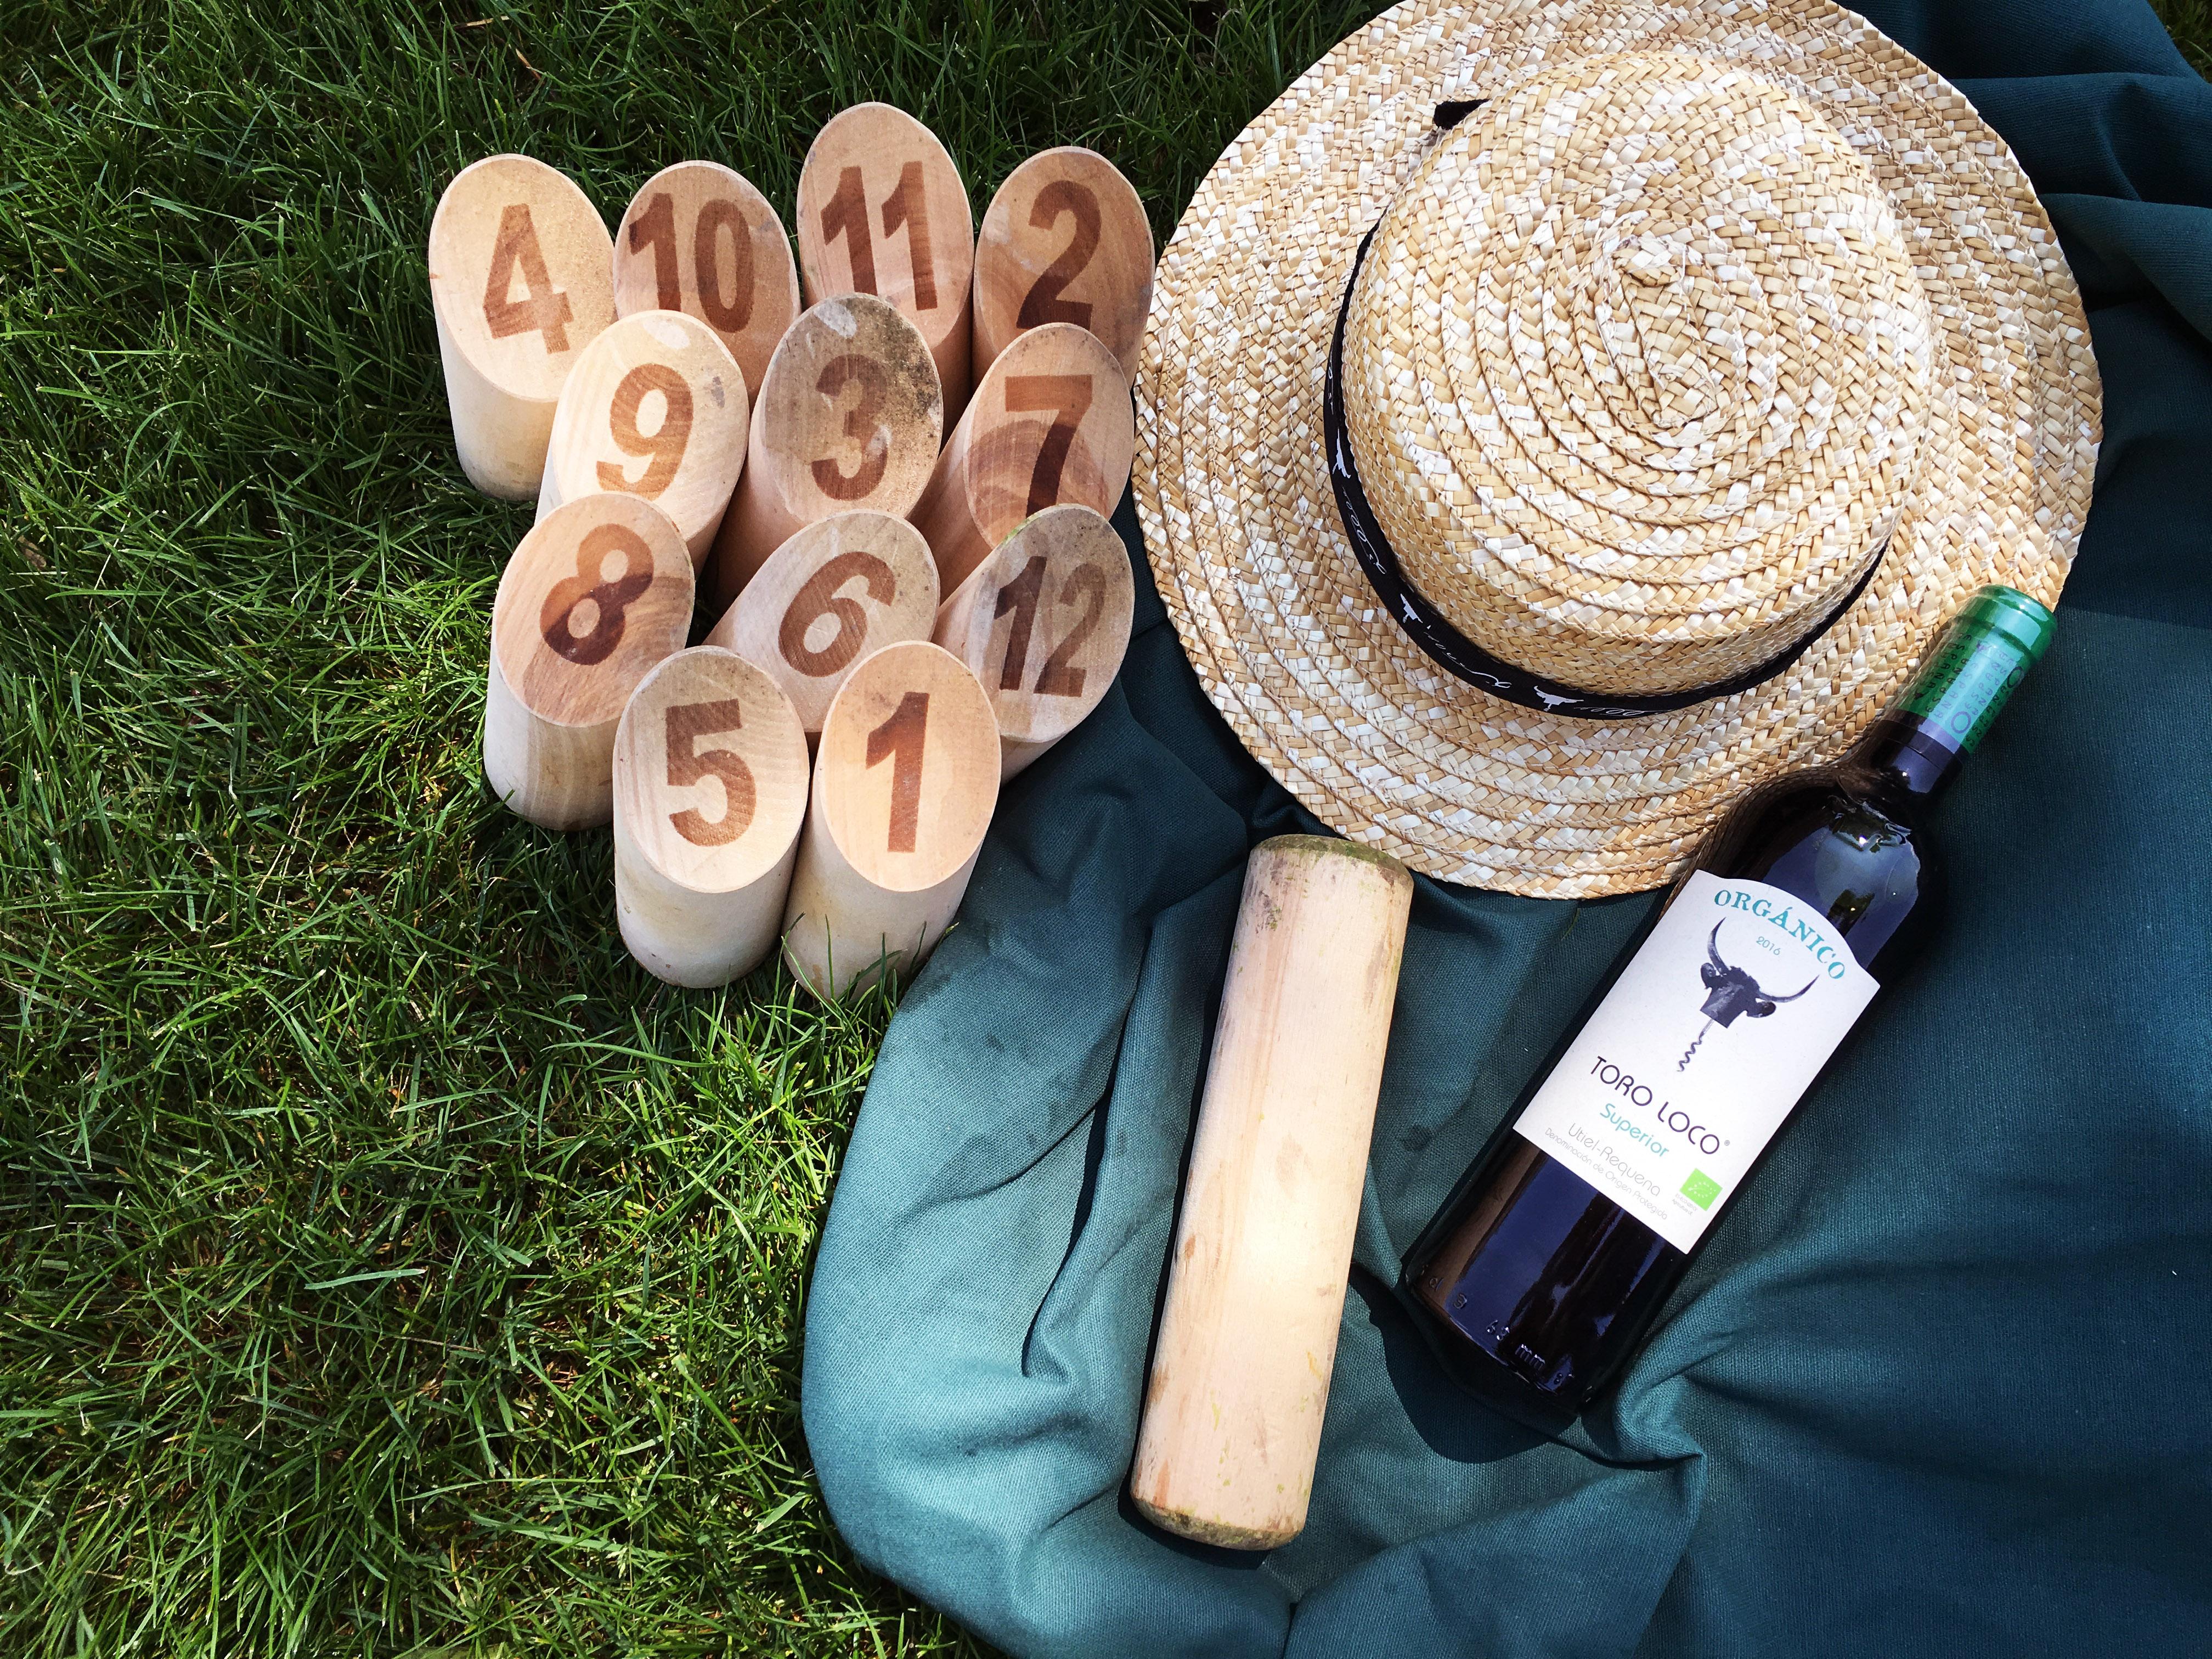 benoit-valerie-calvet-toro-loco-wine-31